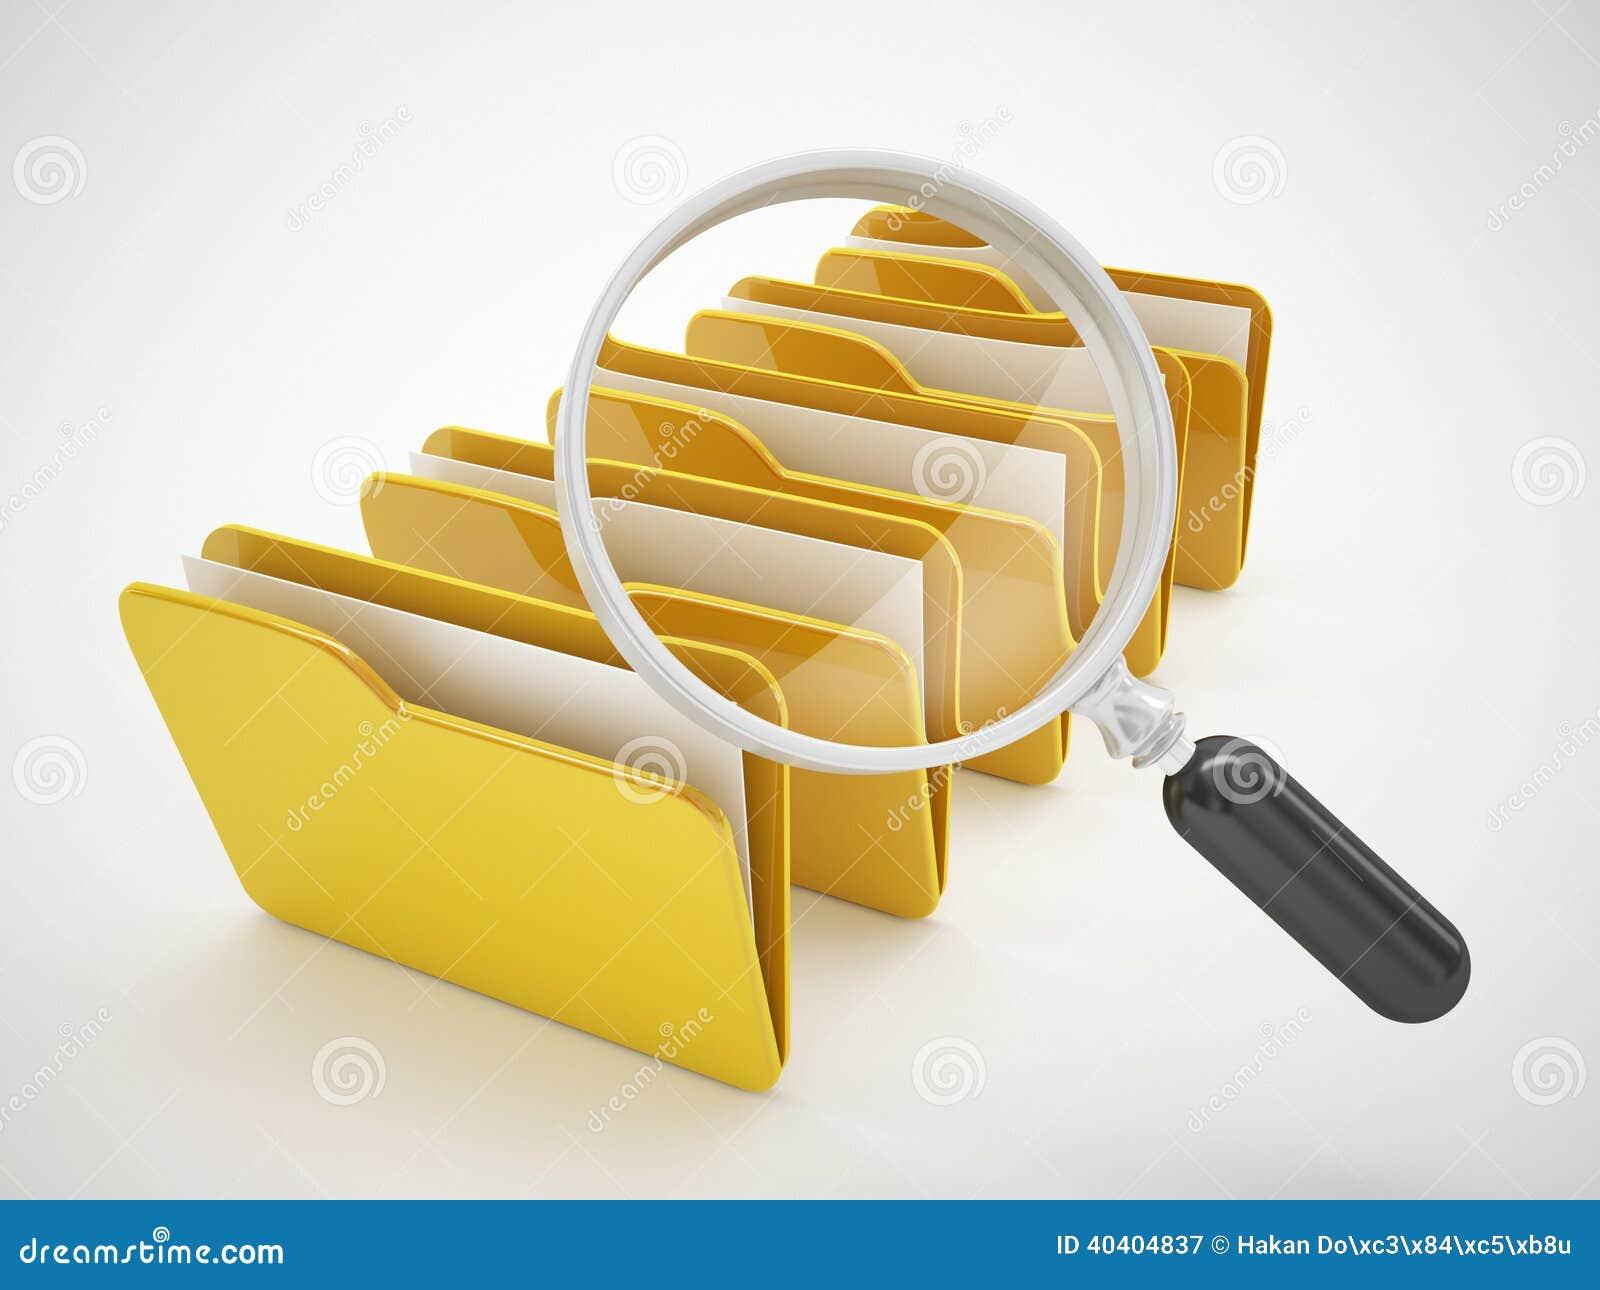 Search File Or Computer File Icon Stock Illustration - Image: 40404837